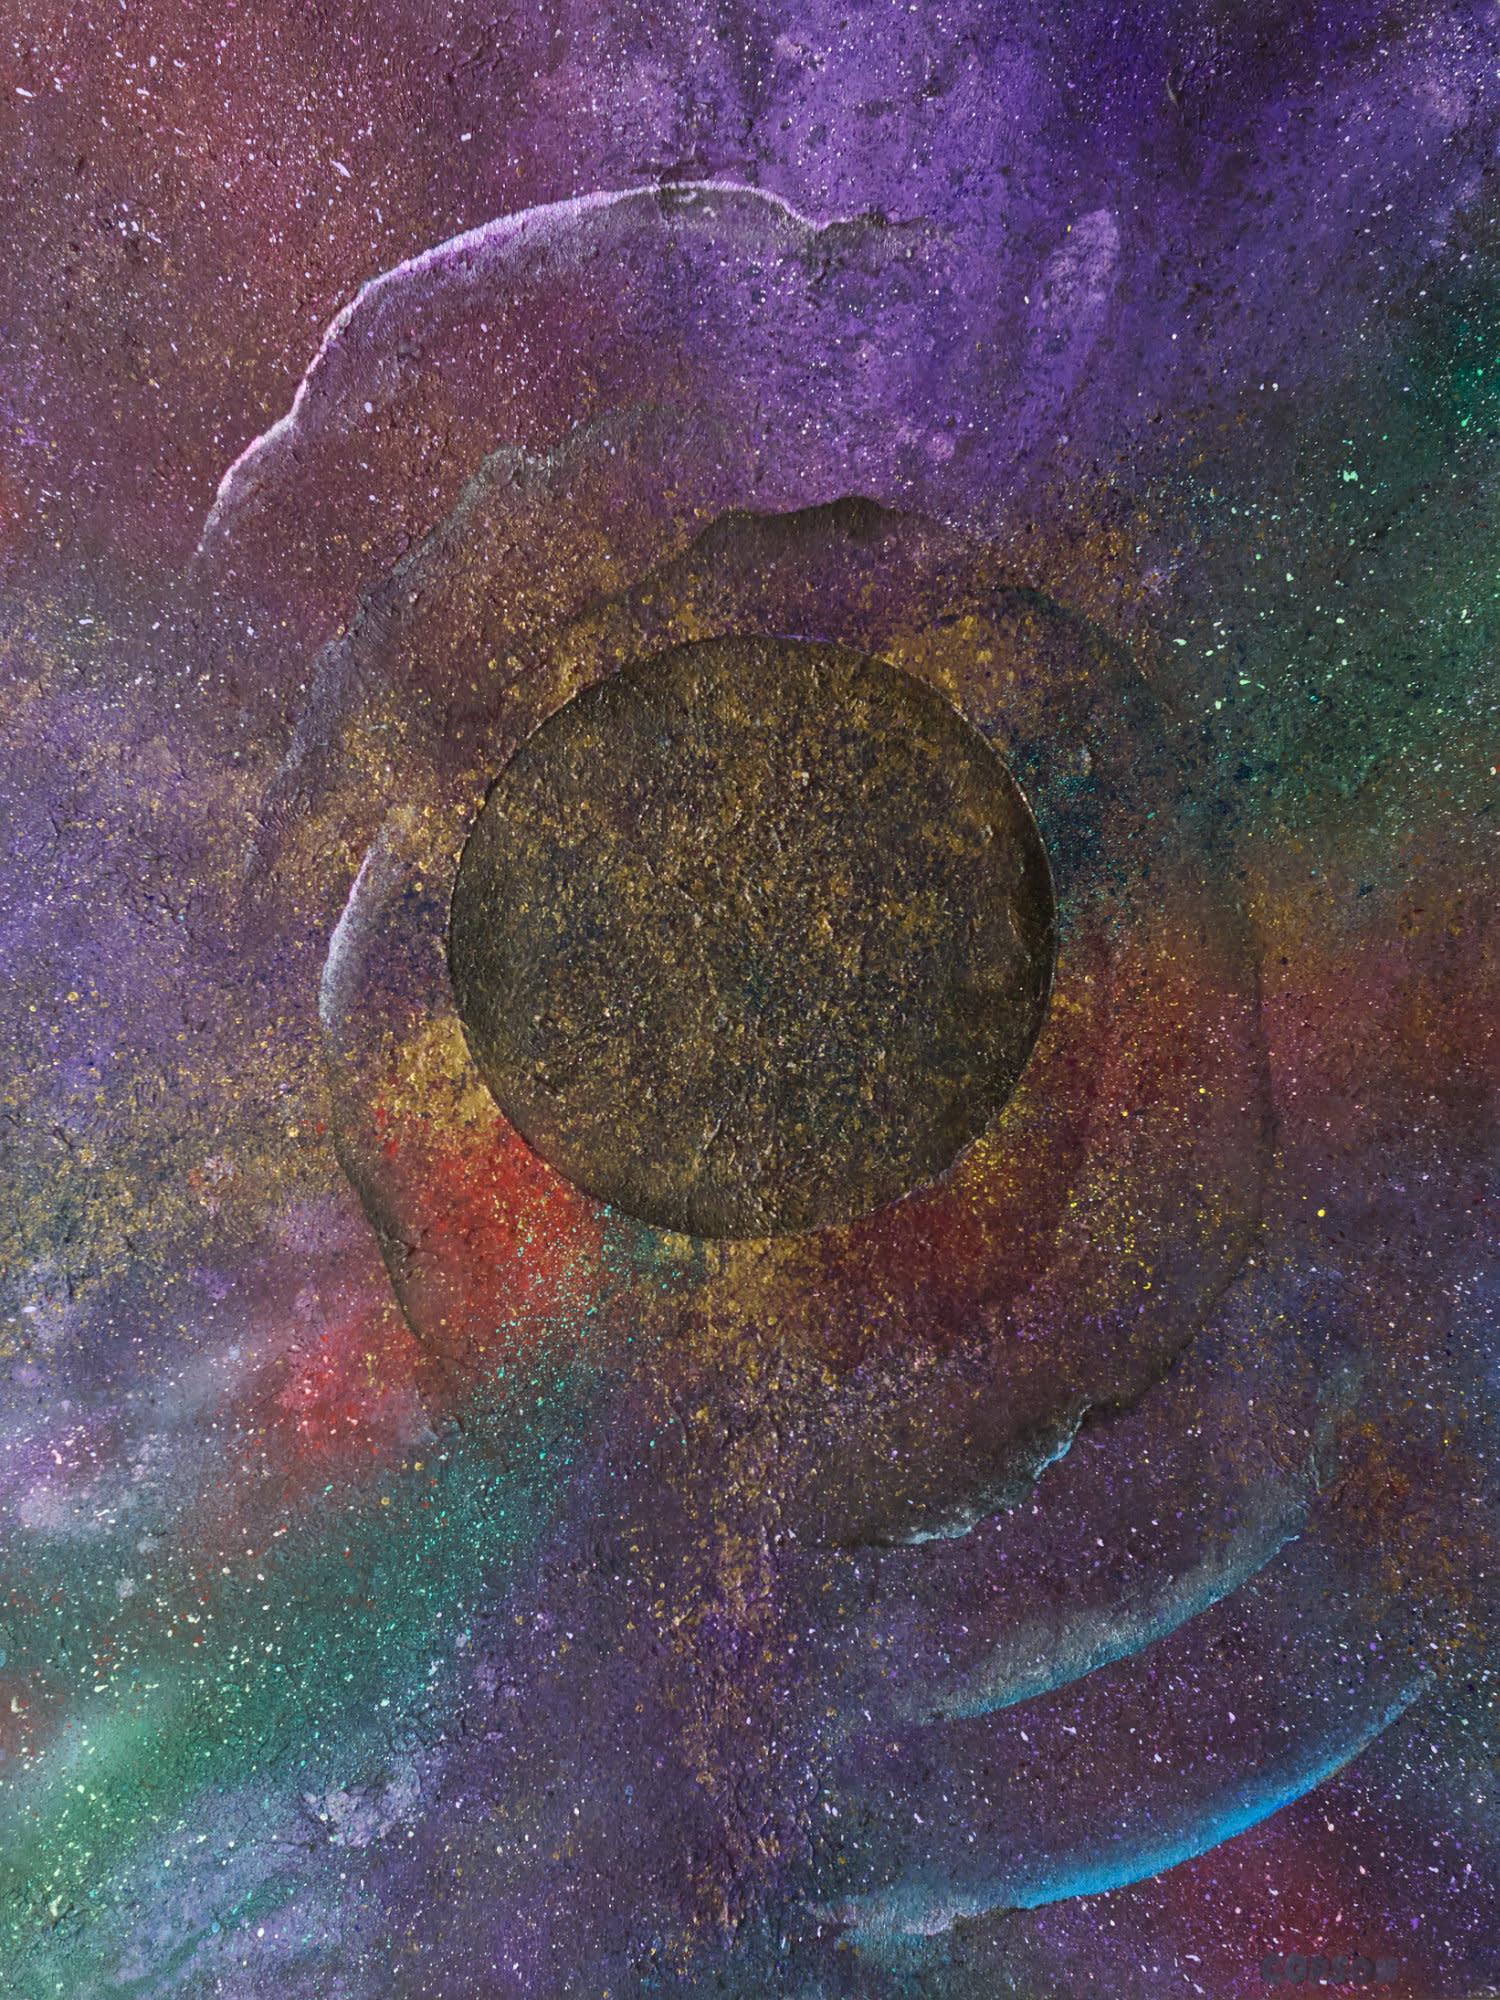 Event horizon 19 cg6vxb